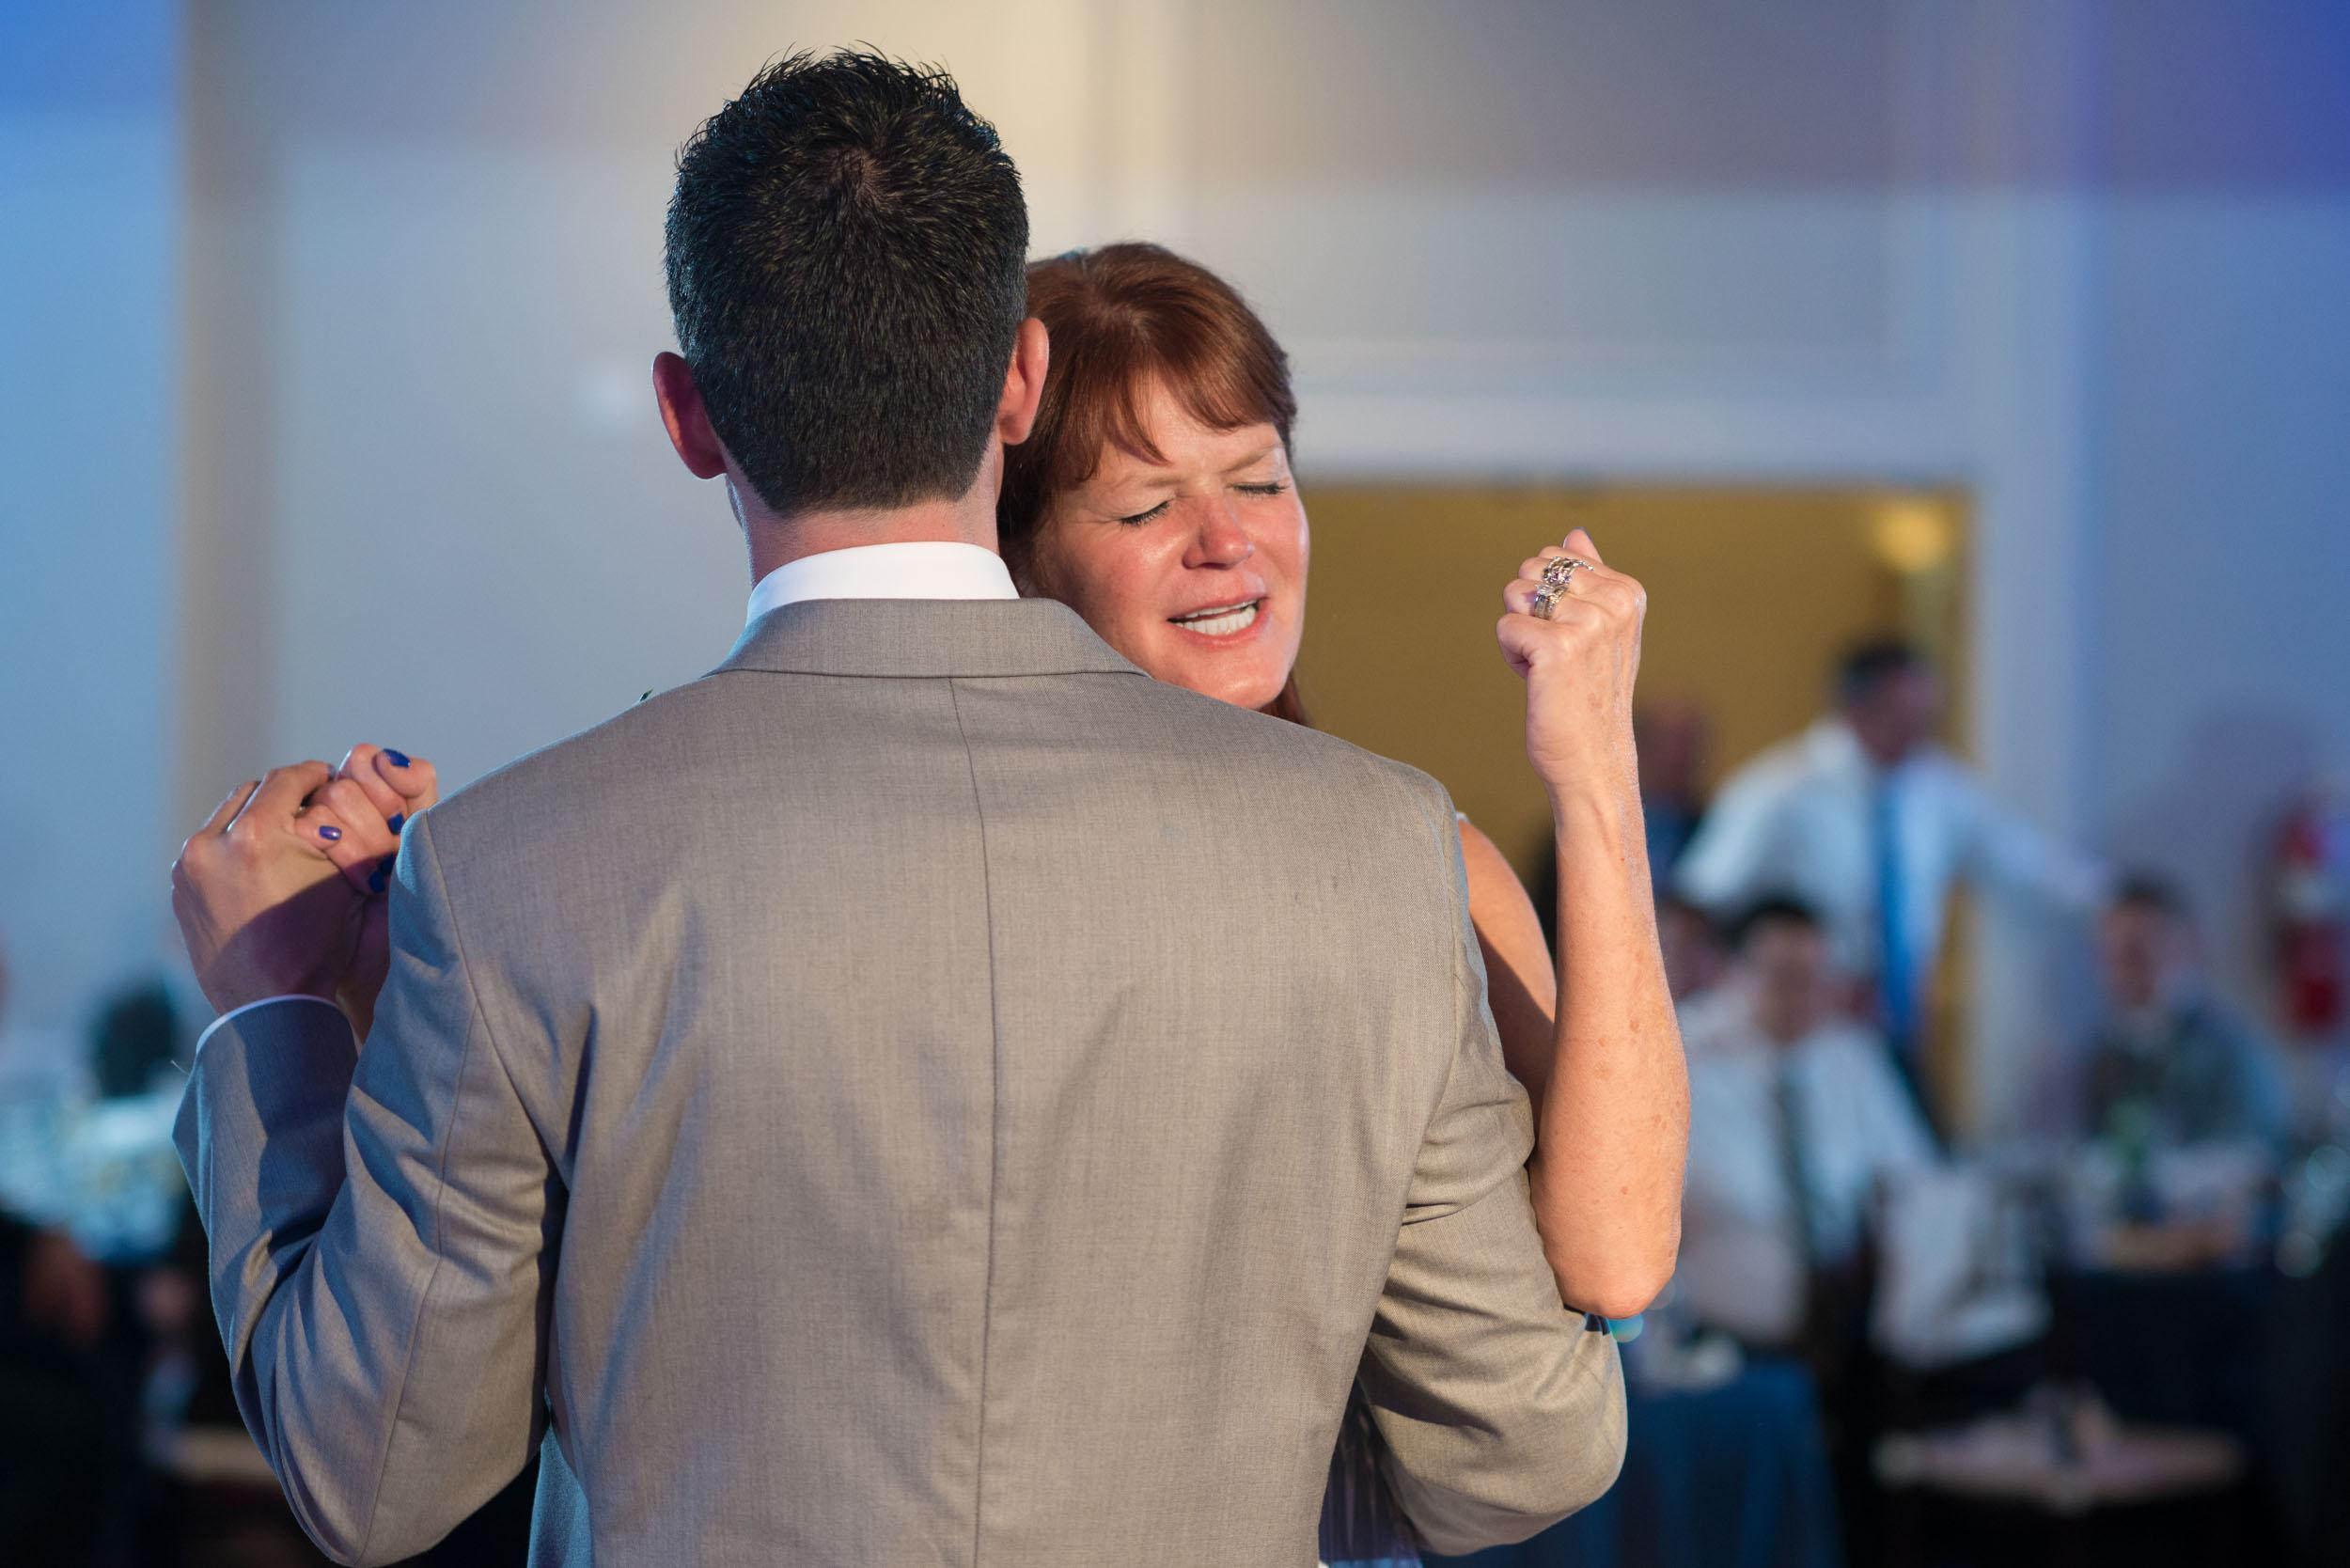 dc+metro+wedding+photographer+vadym+guliuk+photography+wedding+parent+dances-2021.jpg